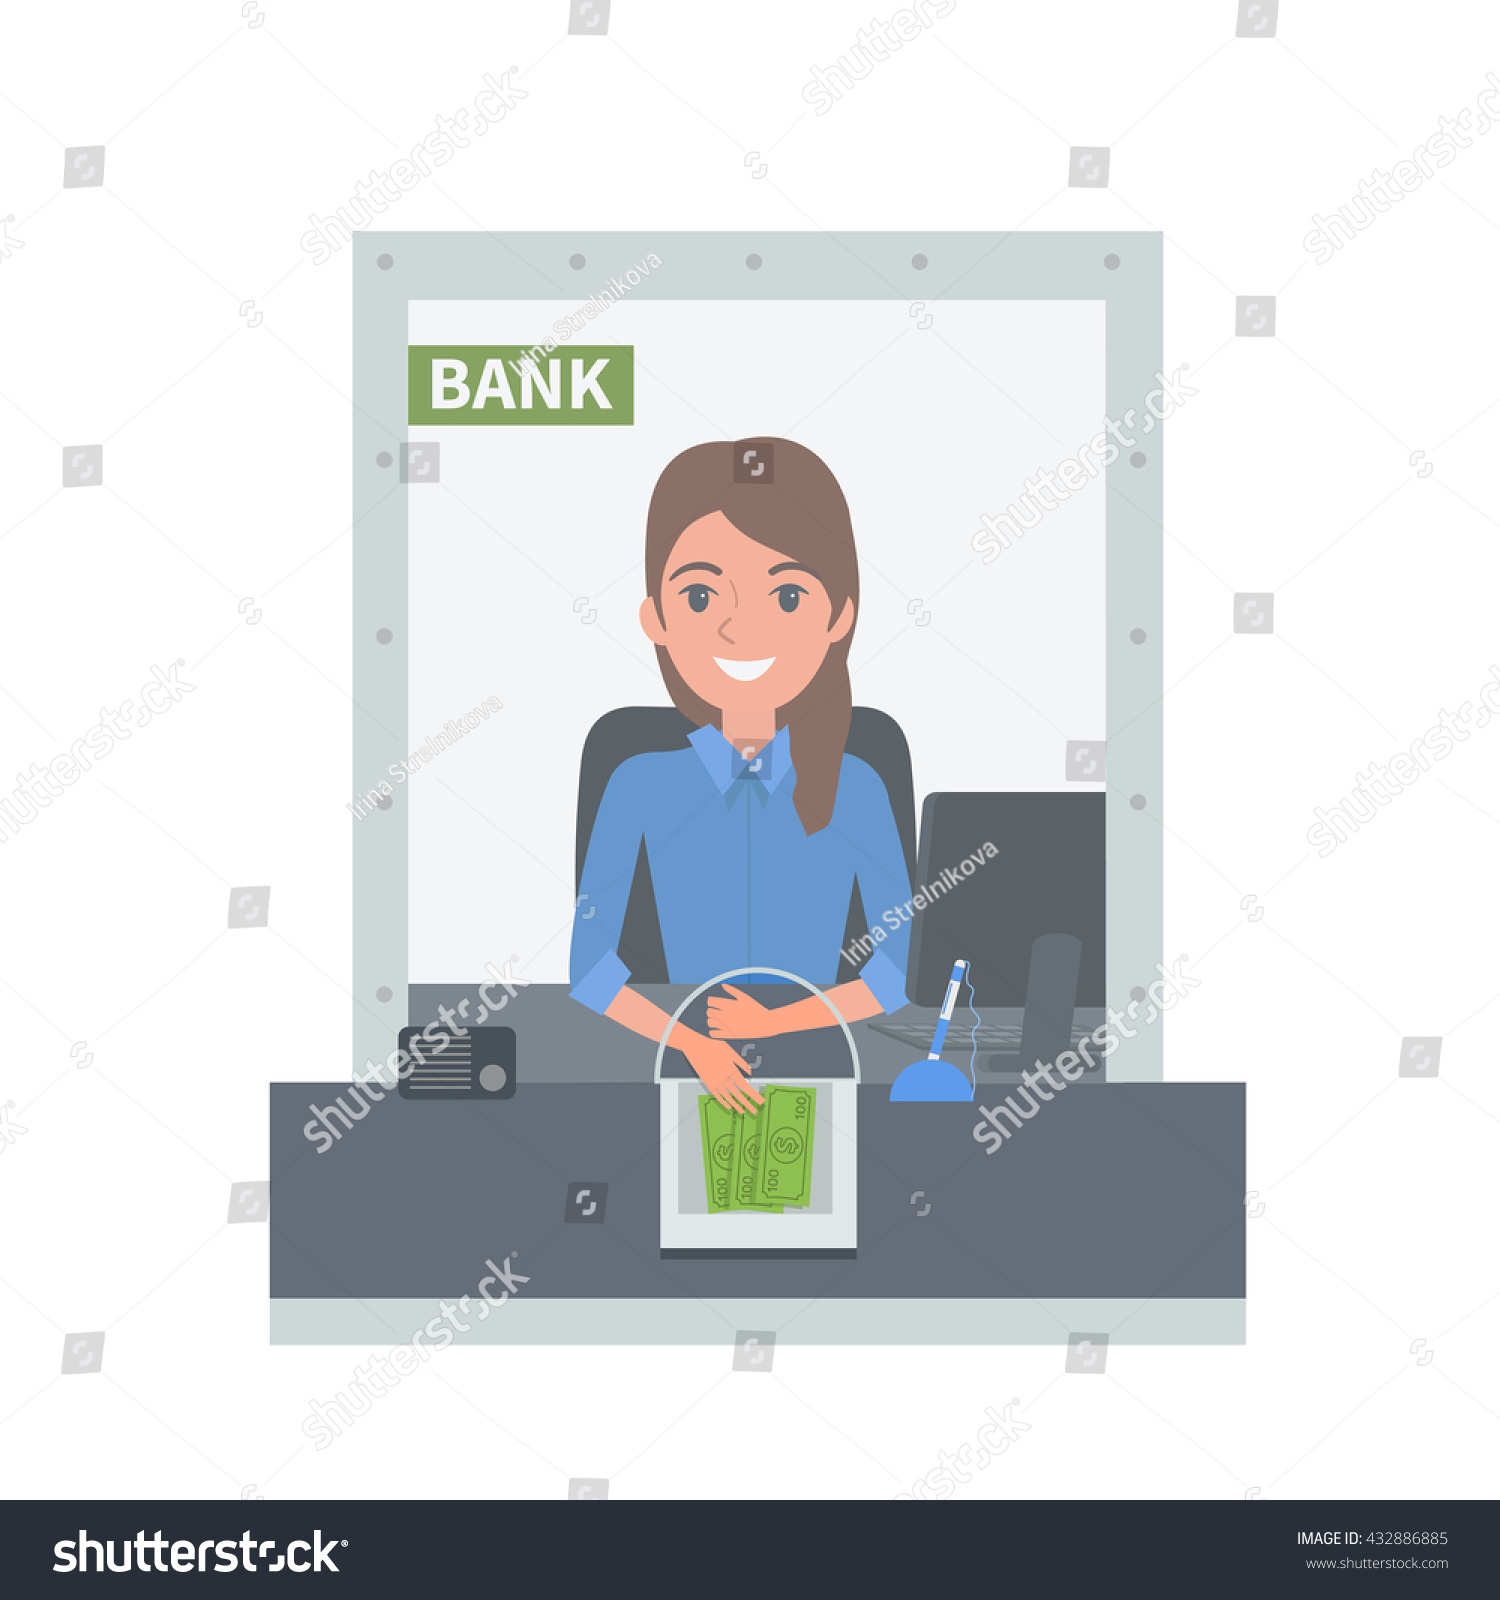 bank cashier behind cash department window stock vector  bank cashier behind cash department window vector concept illustration